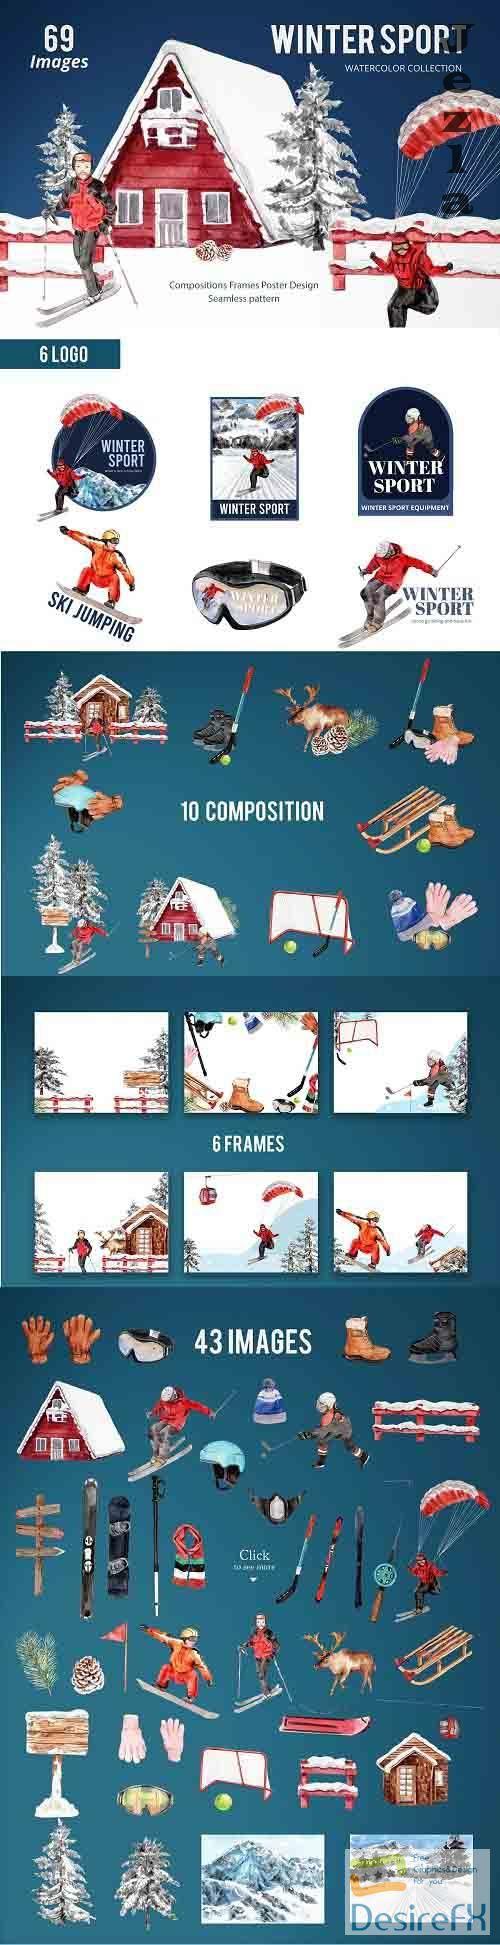 Winter Sports Watercolor - 5651895